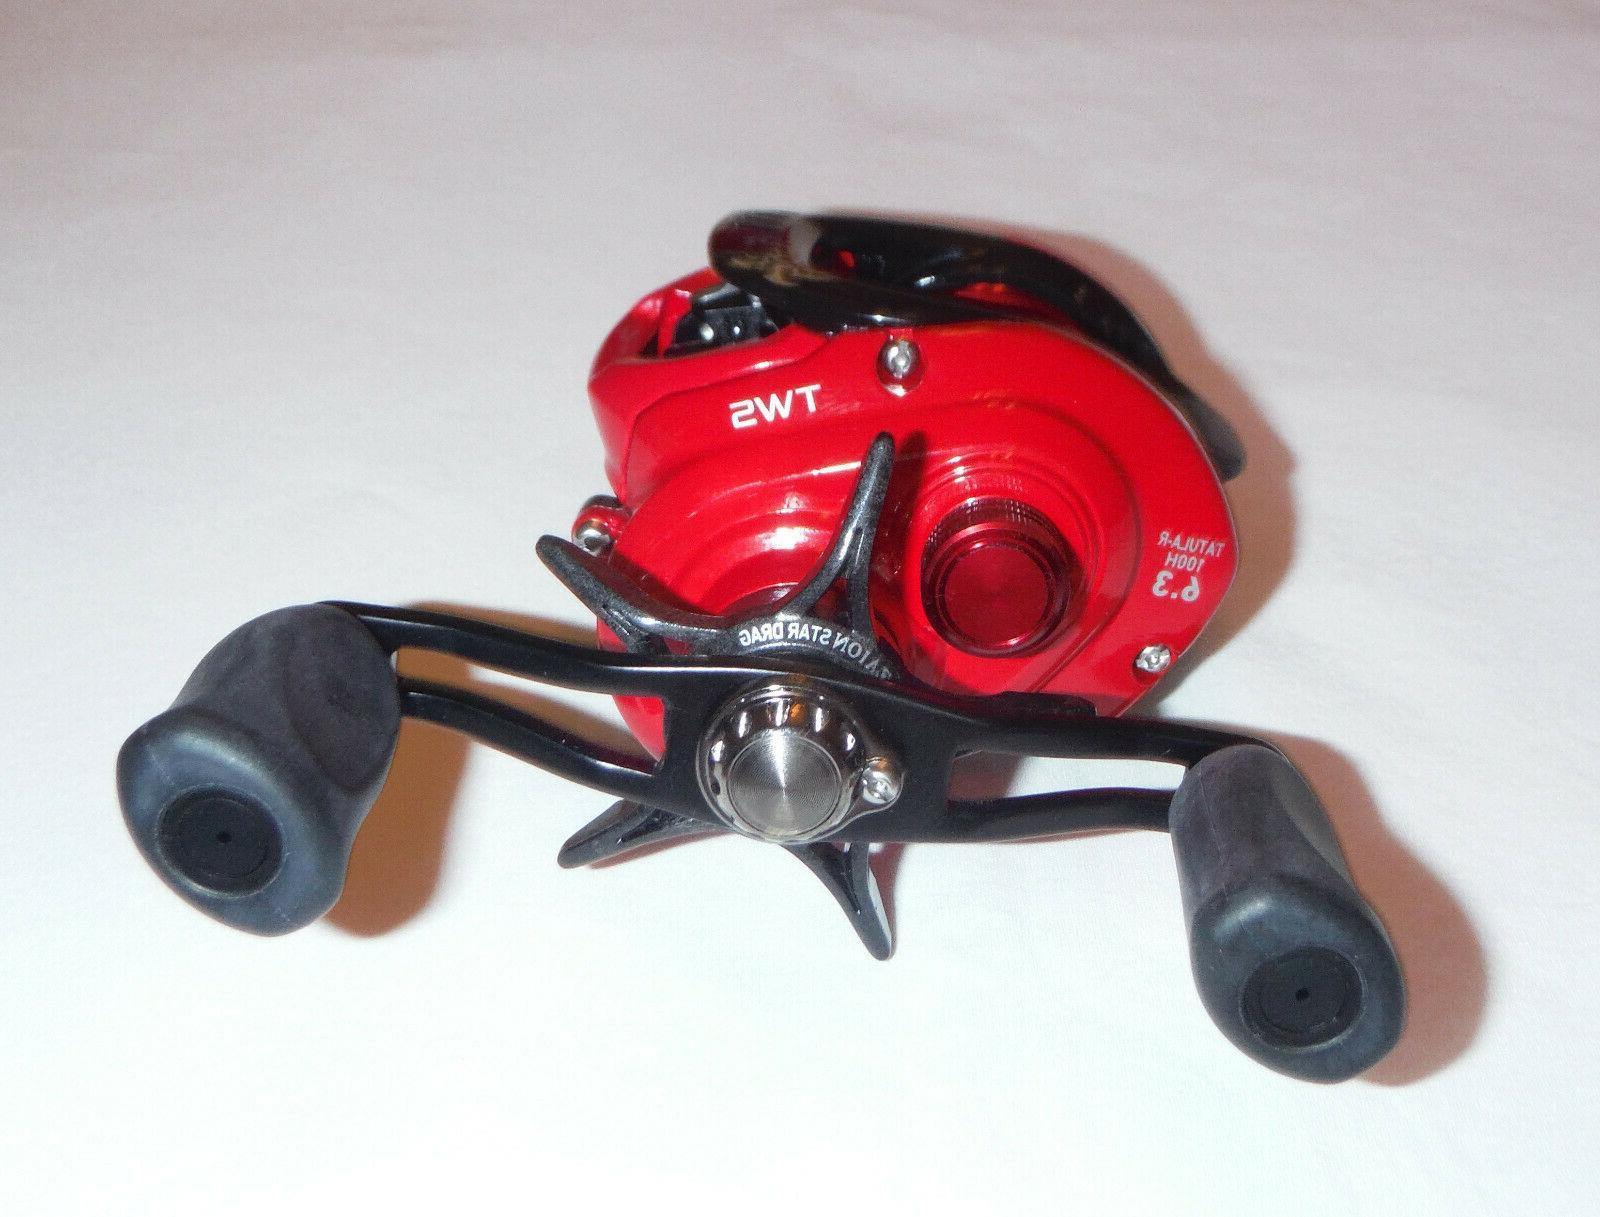 Daiwa Type-R Red Baitcasting